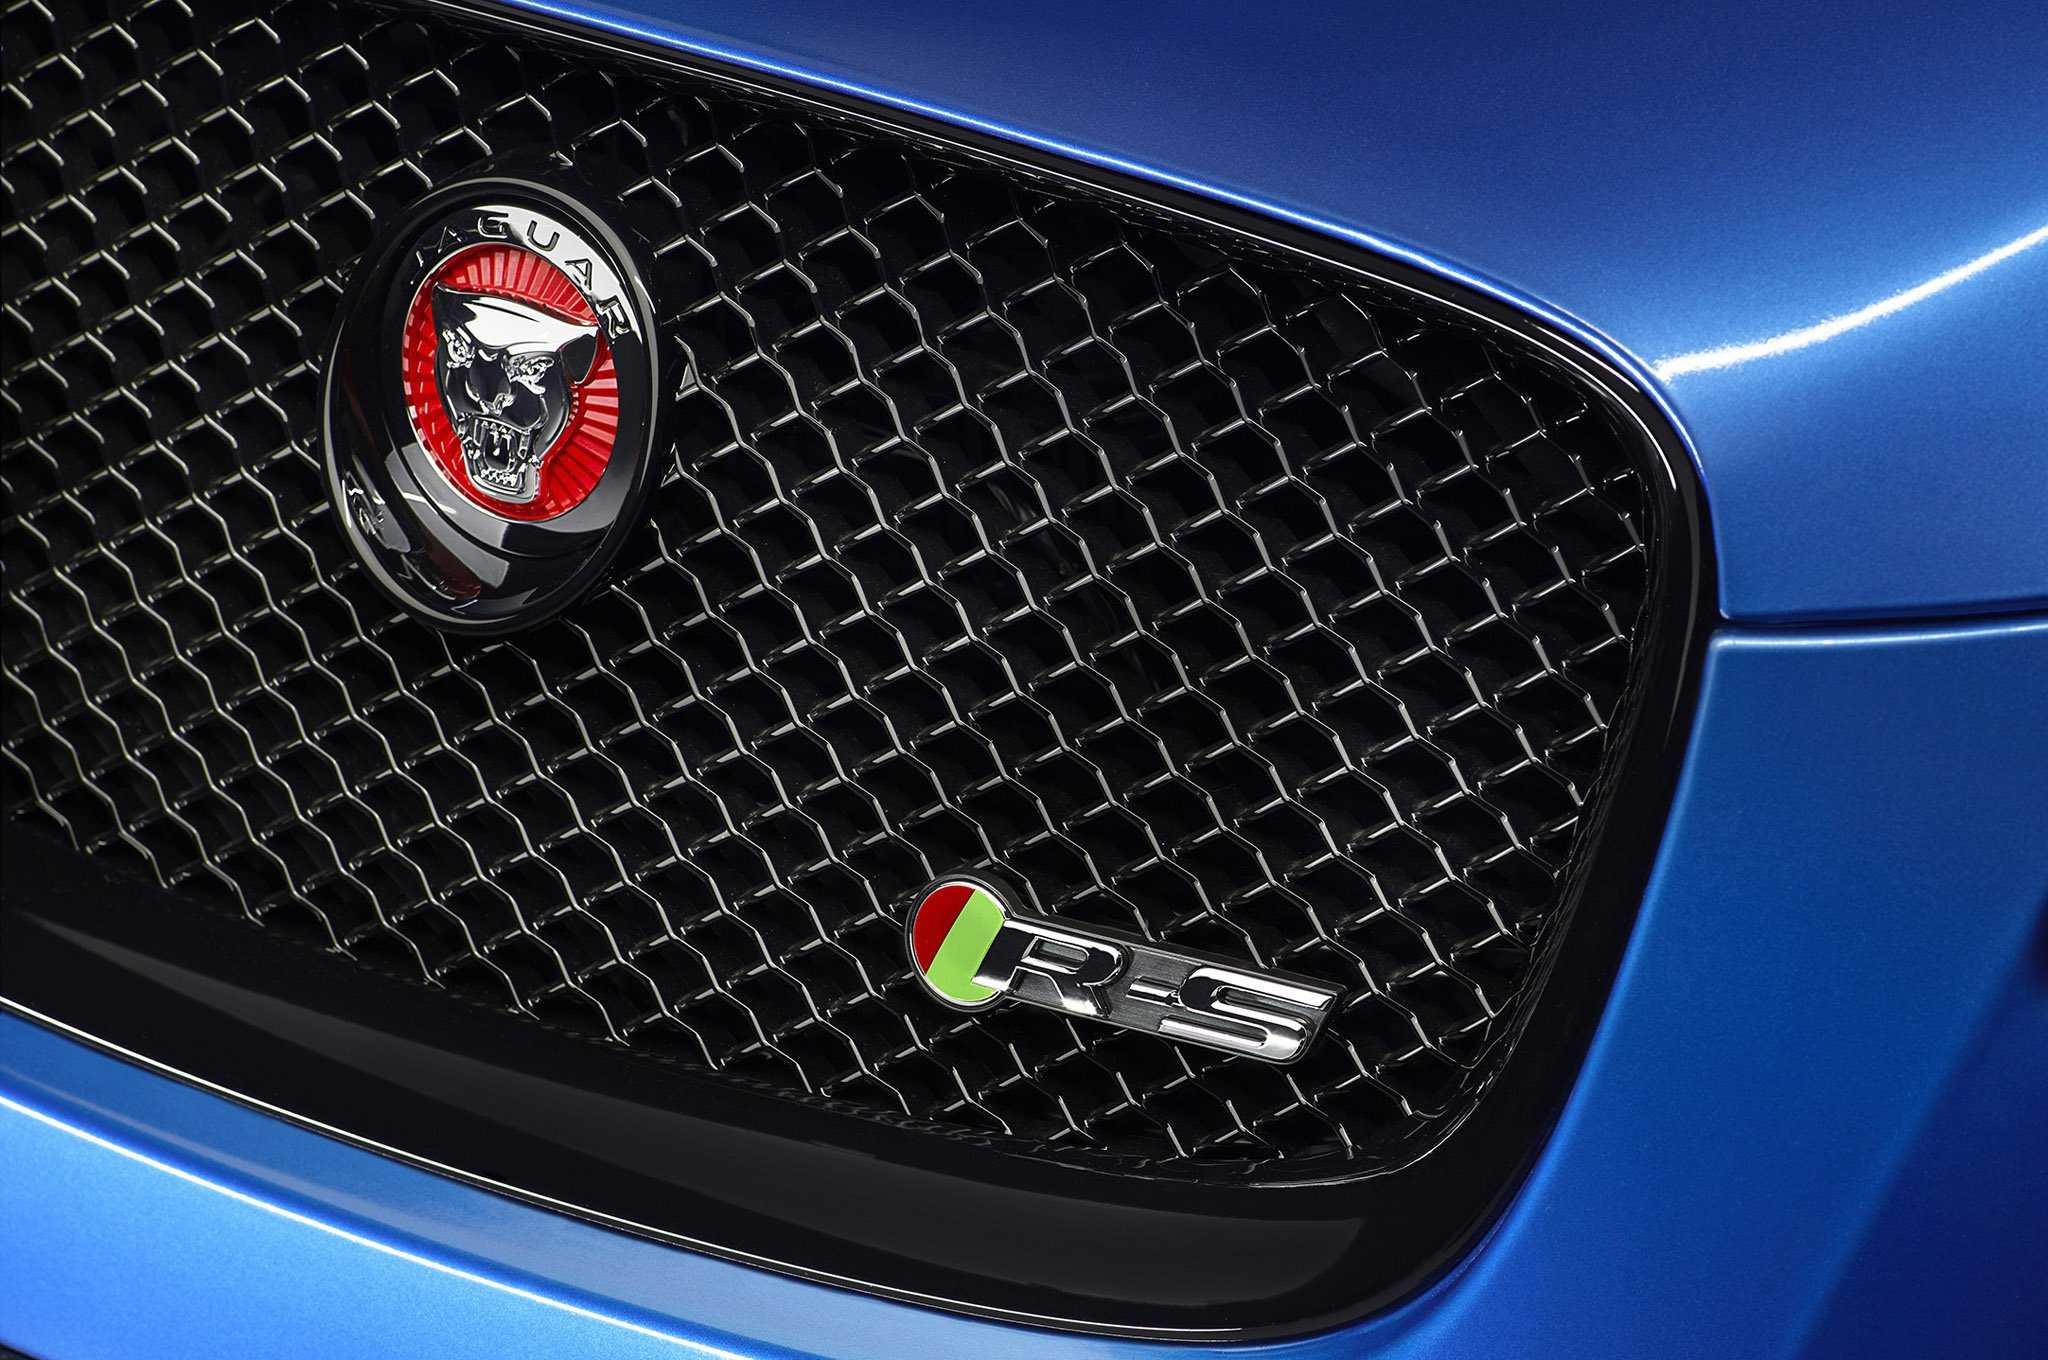 Jaguar xfr-s (ягуар эксэфар-с)